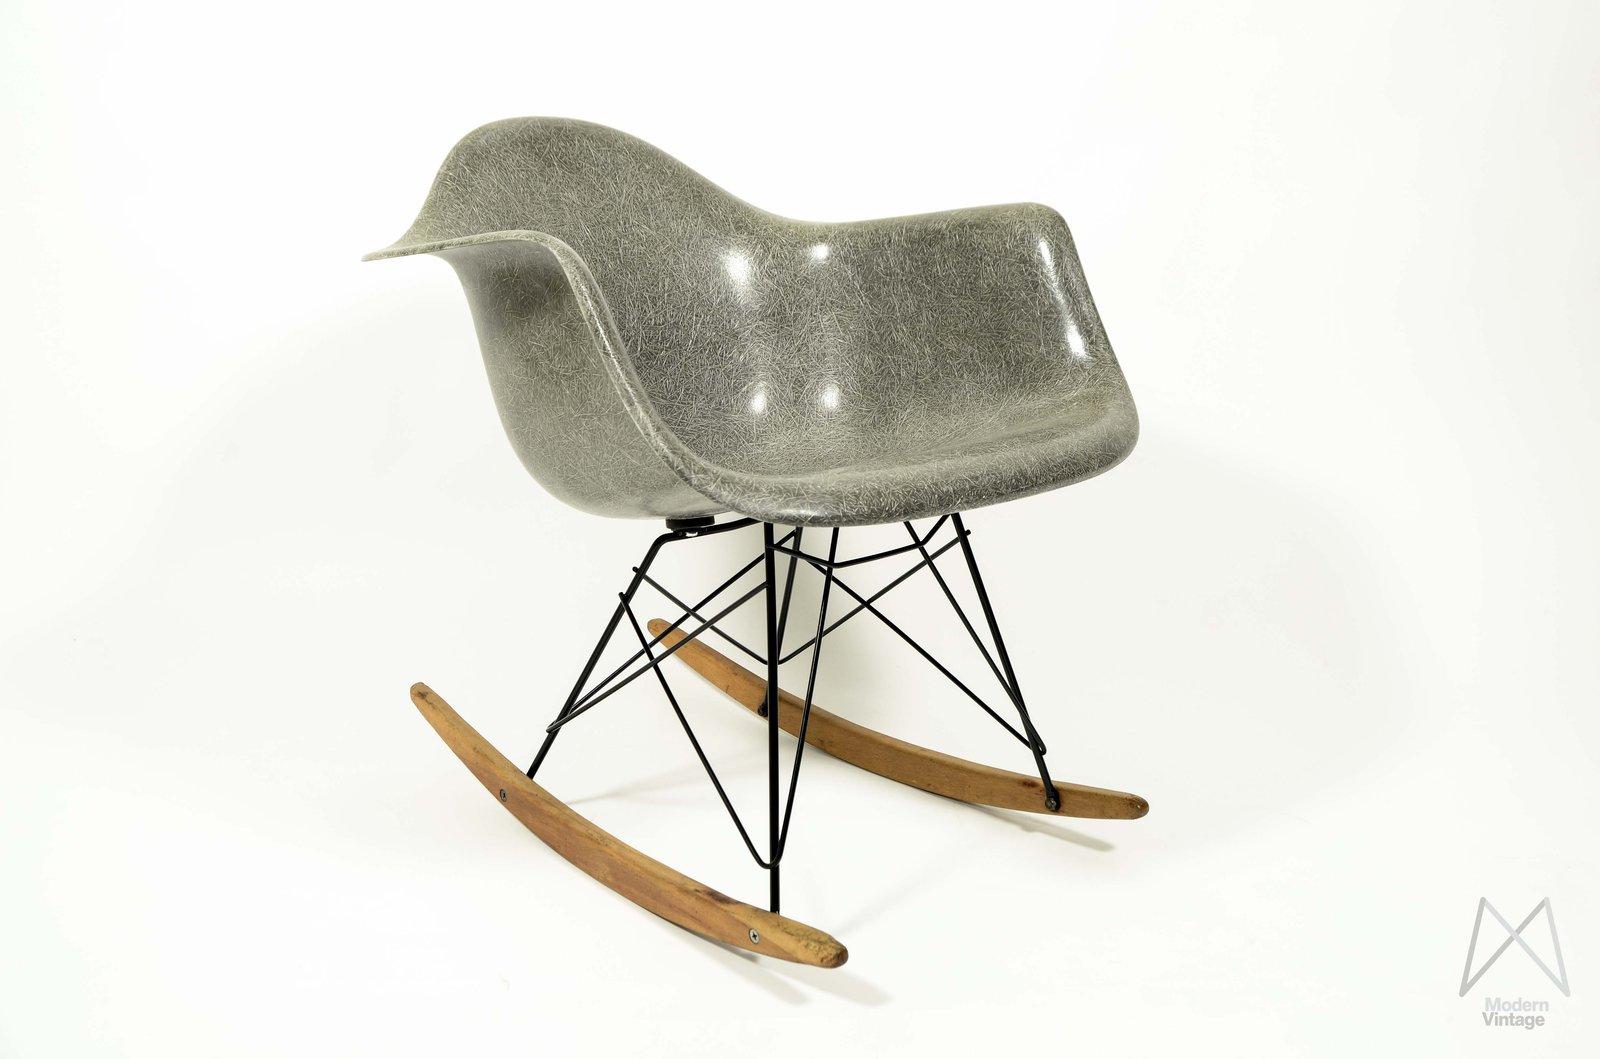 Kuipstoel eames best vitra eames daw stoel with kuipstoel for Eames kuipstoel